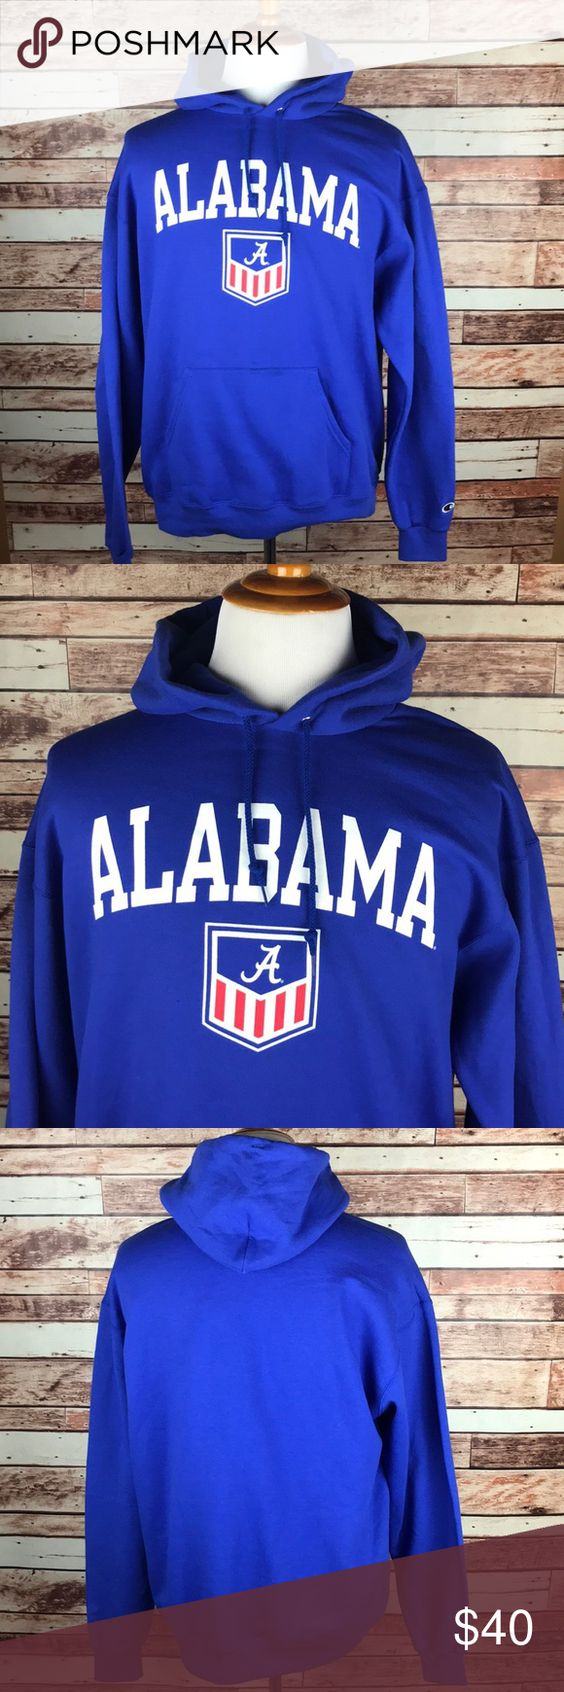 Alabama Crimson Tide Blue Hoodie Sweatshirt Large Sweatshirts Blue Hoodie Sweatshirts Hoodie [ 1692 x 564 Pixel ]